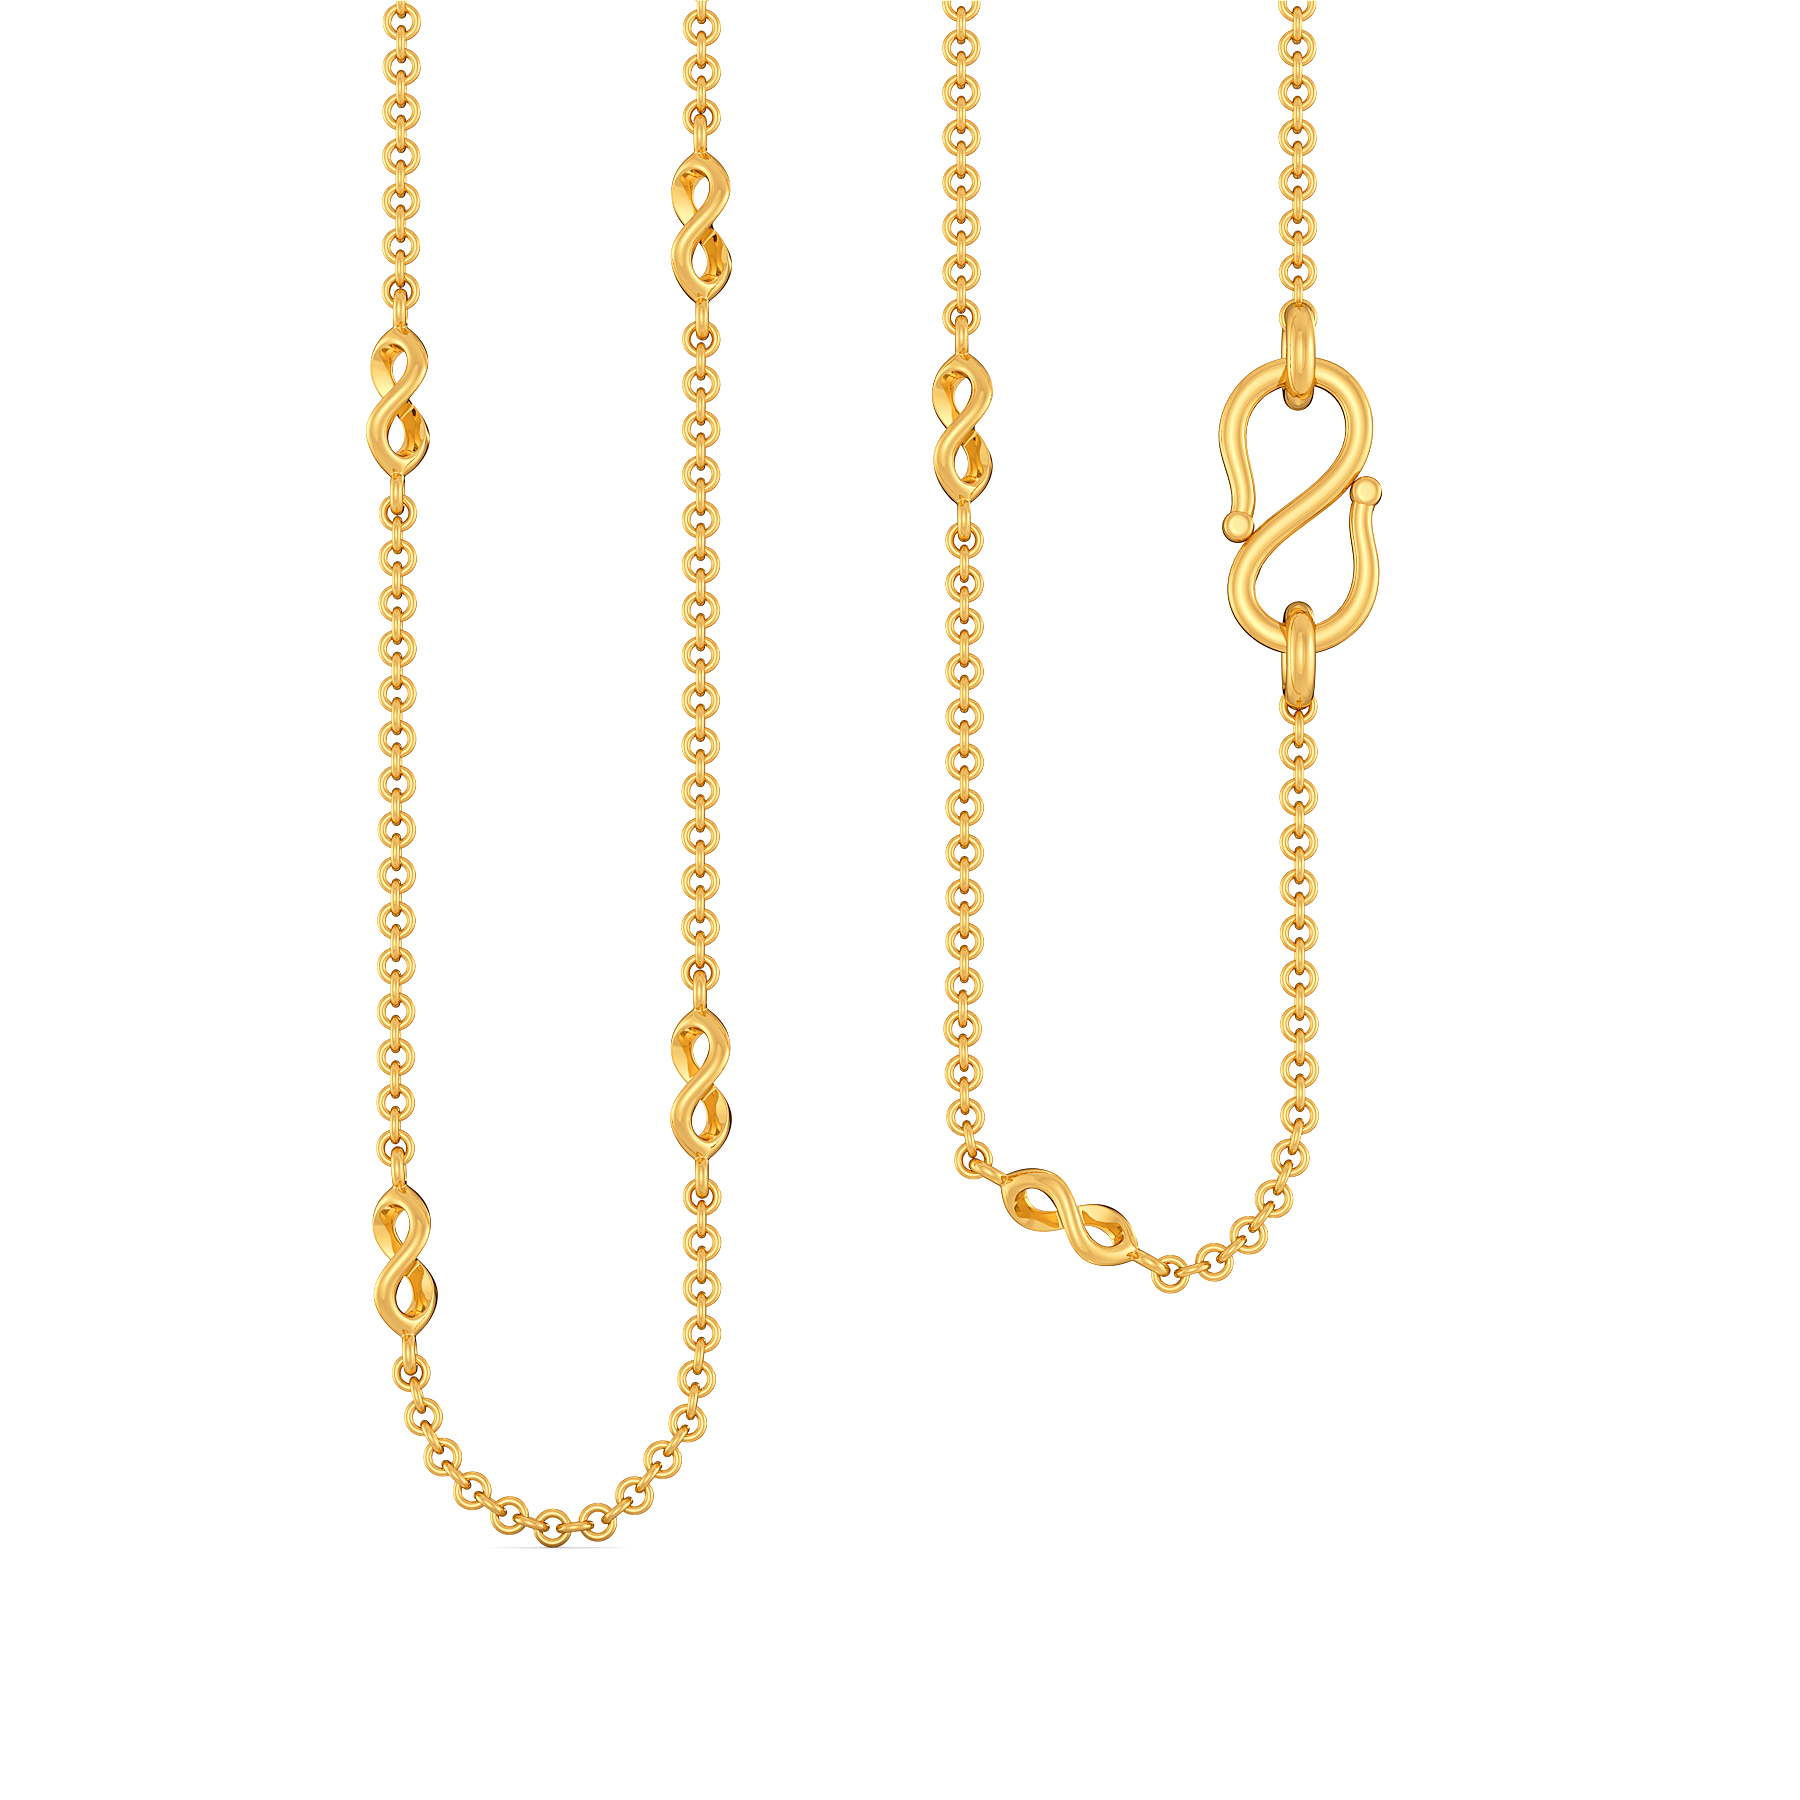 Fine N Divine Gold Chains